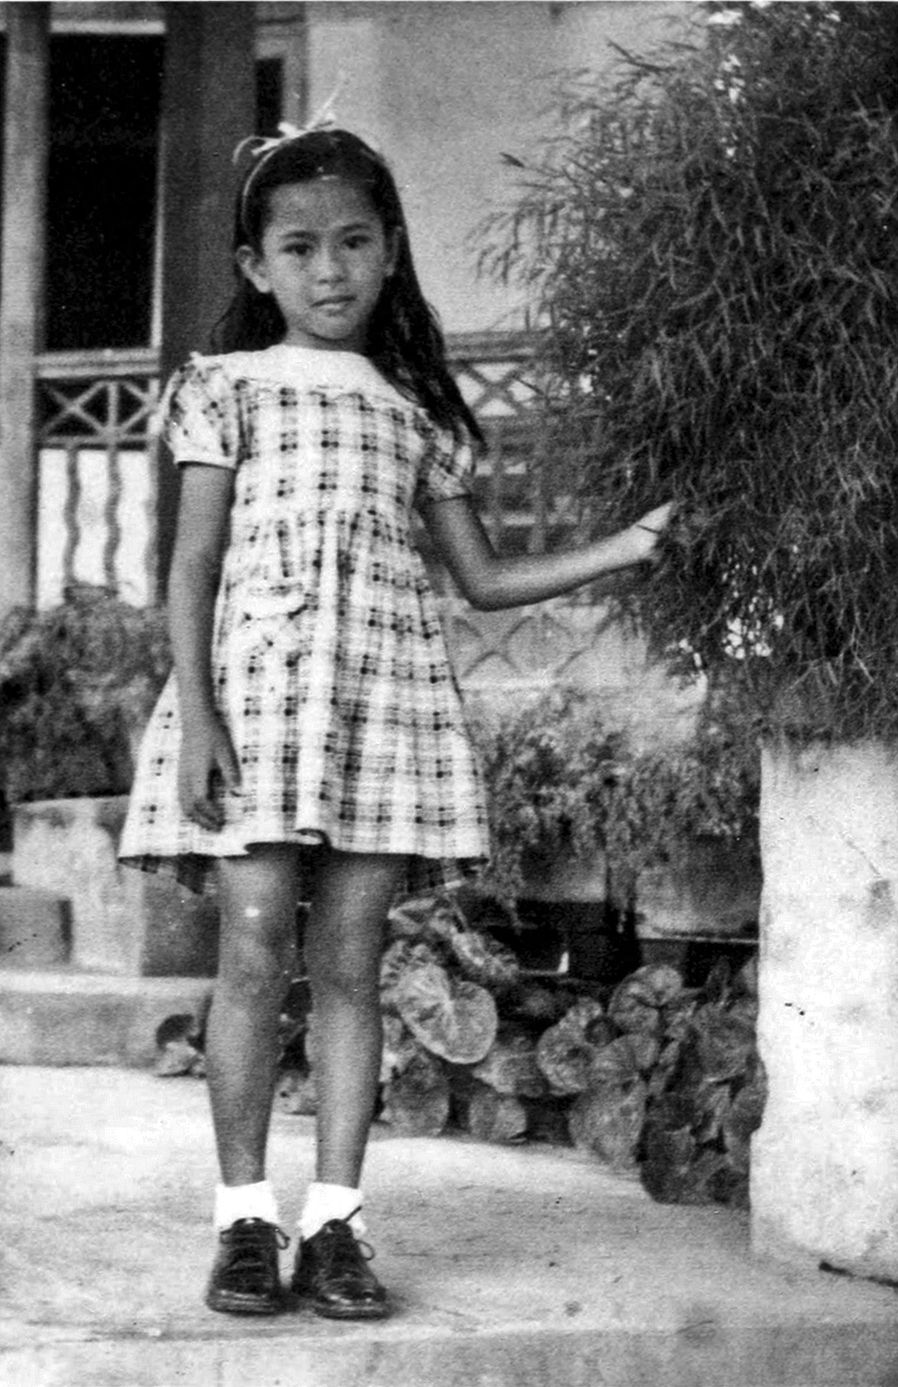 aung san suu kyi short essay burma opposition leader aung san suu kyi atilde130acirccopysoe than winafp